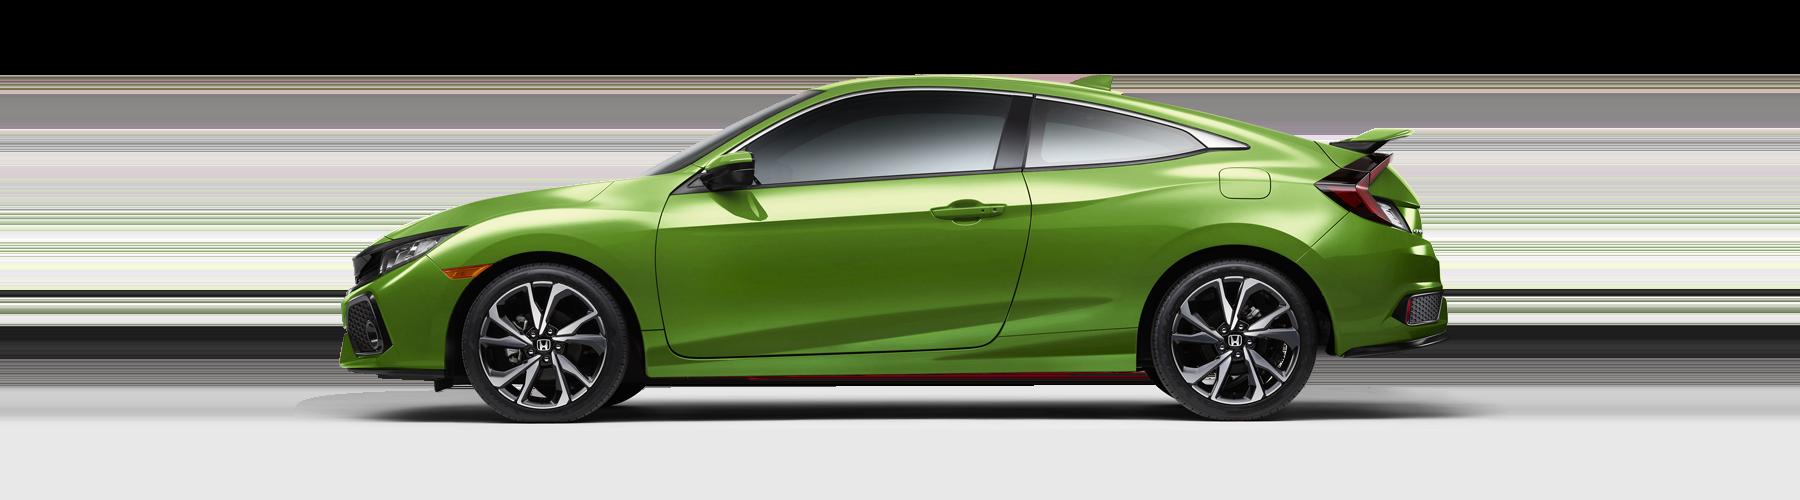 2017 Honda Civic Si Coupe Side Profile